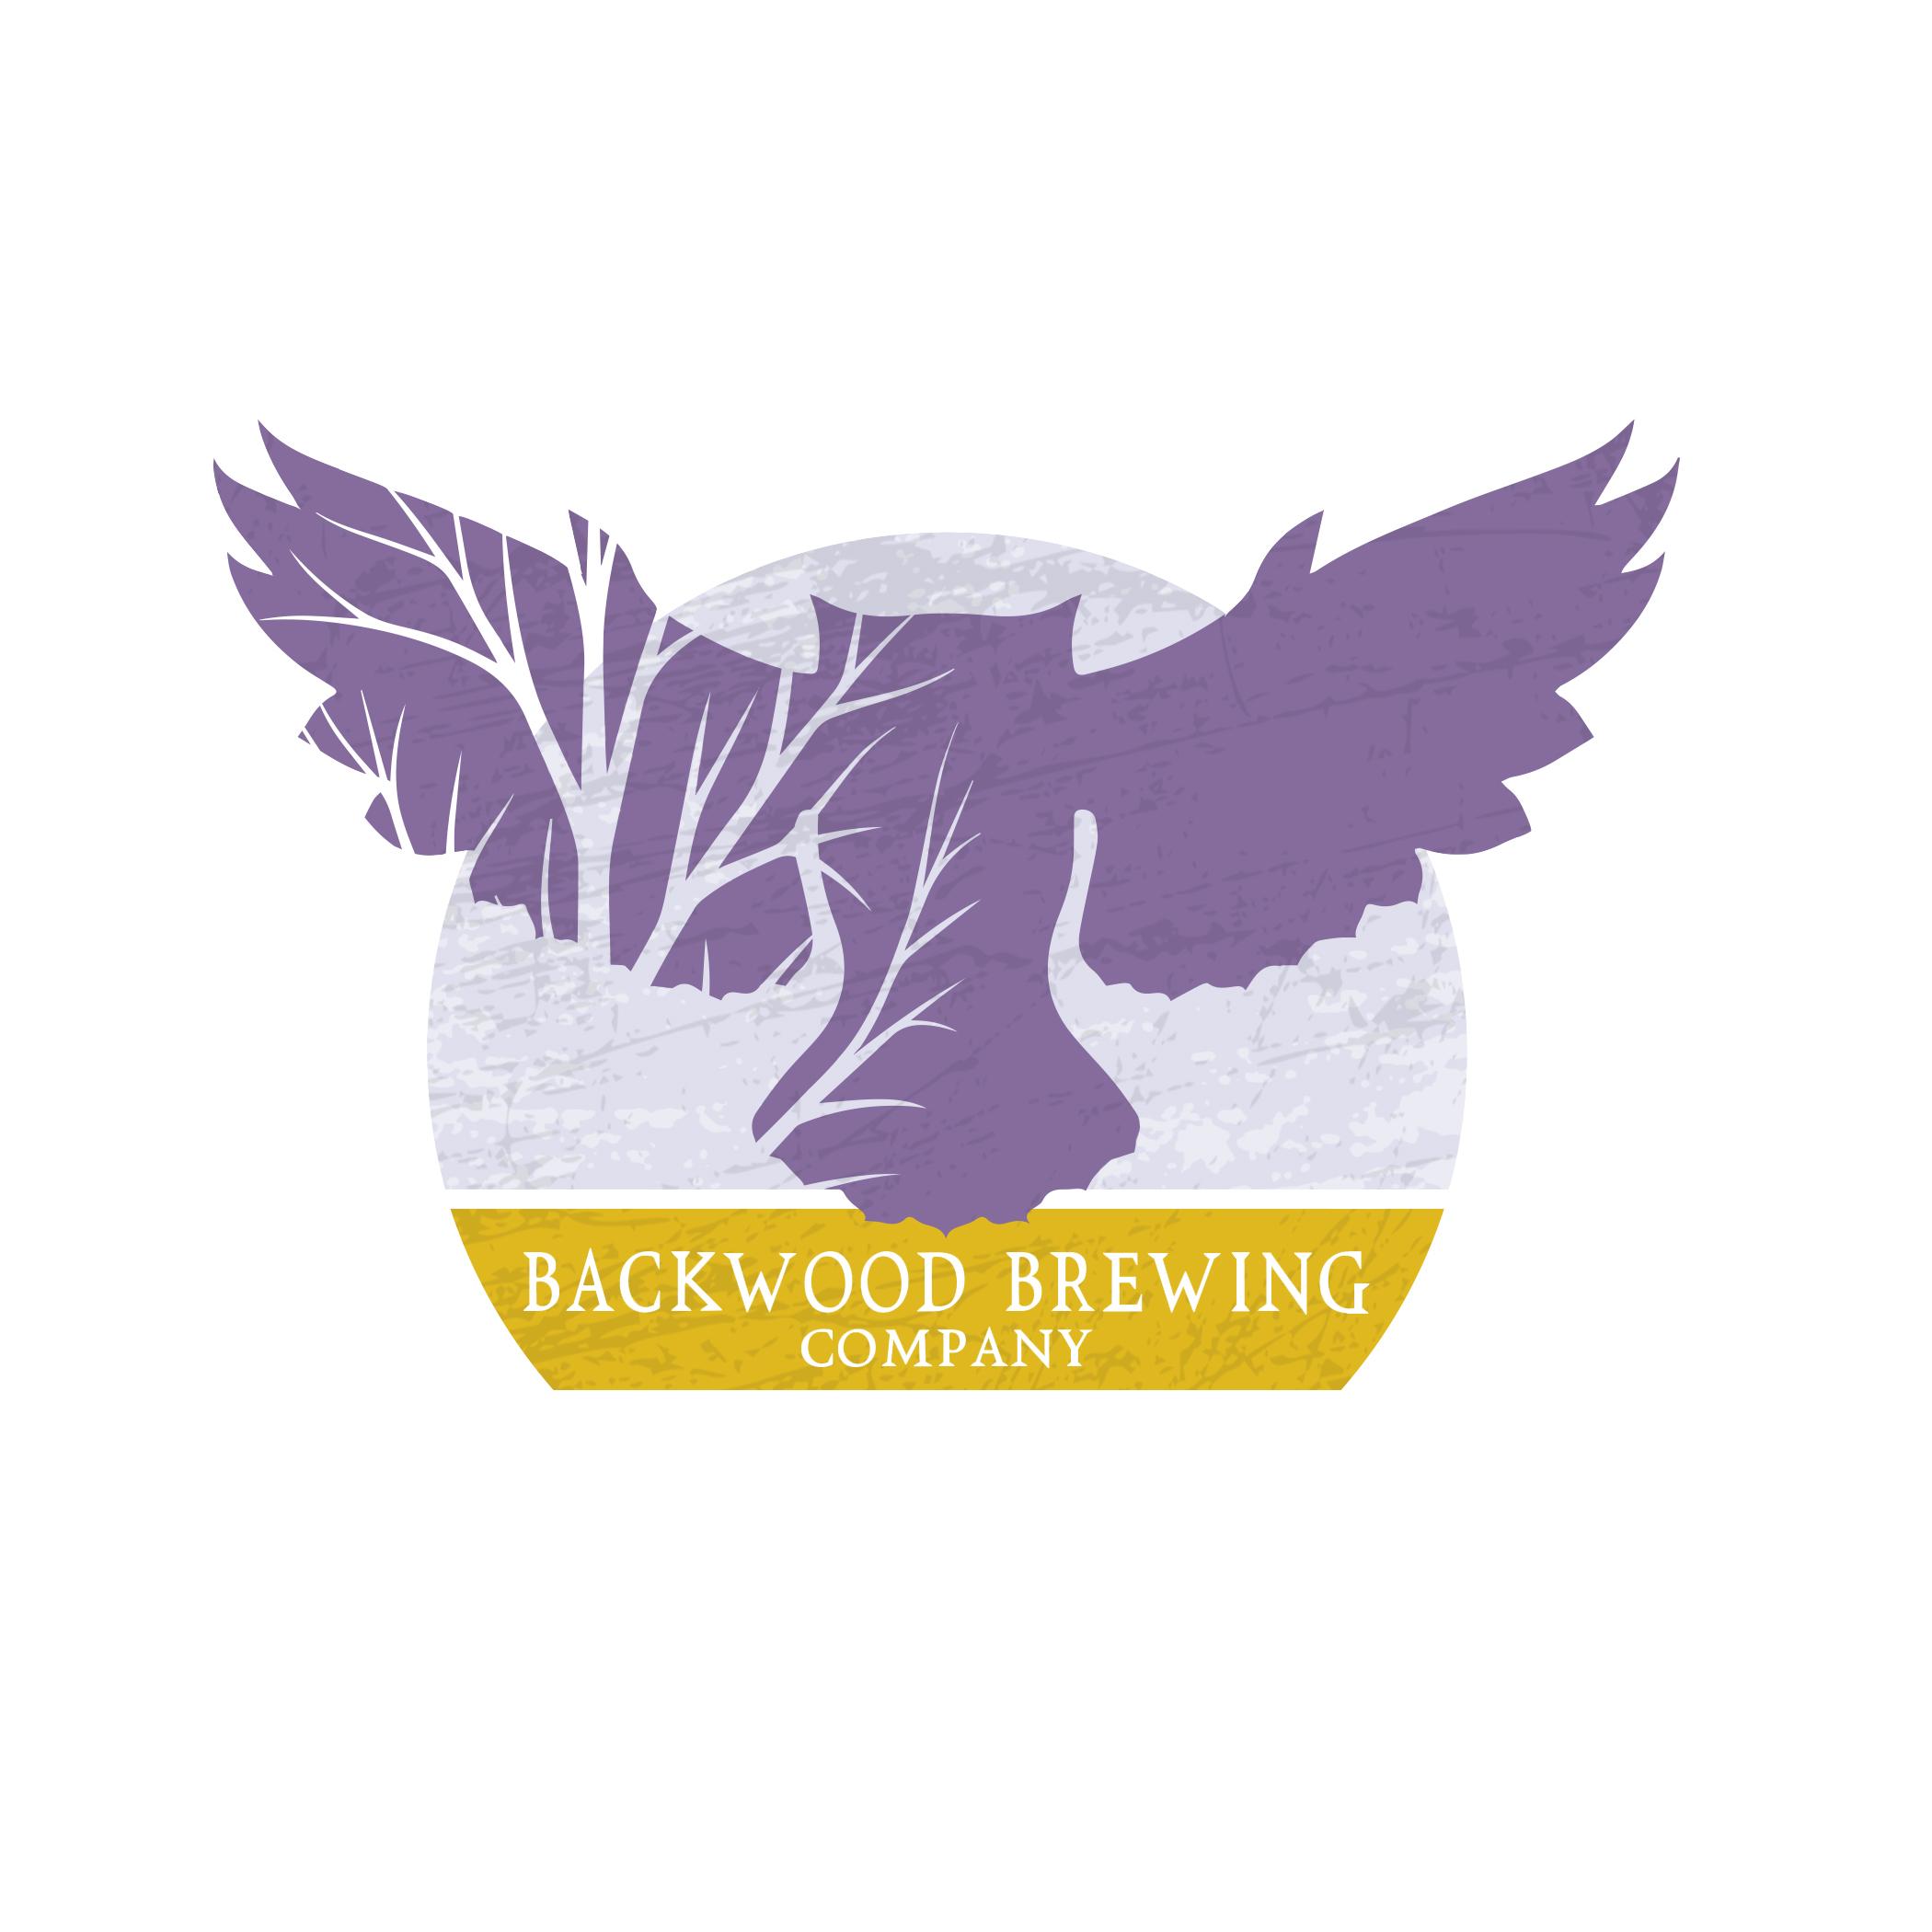 Backwood Brewing Company